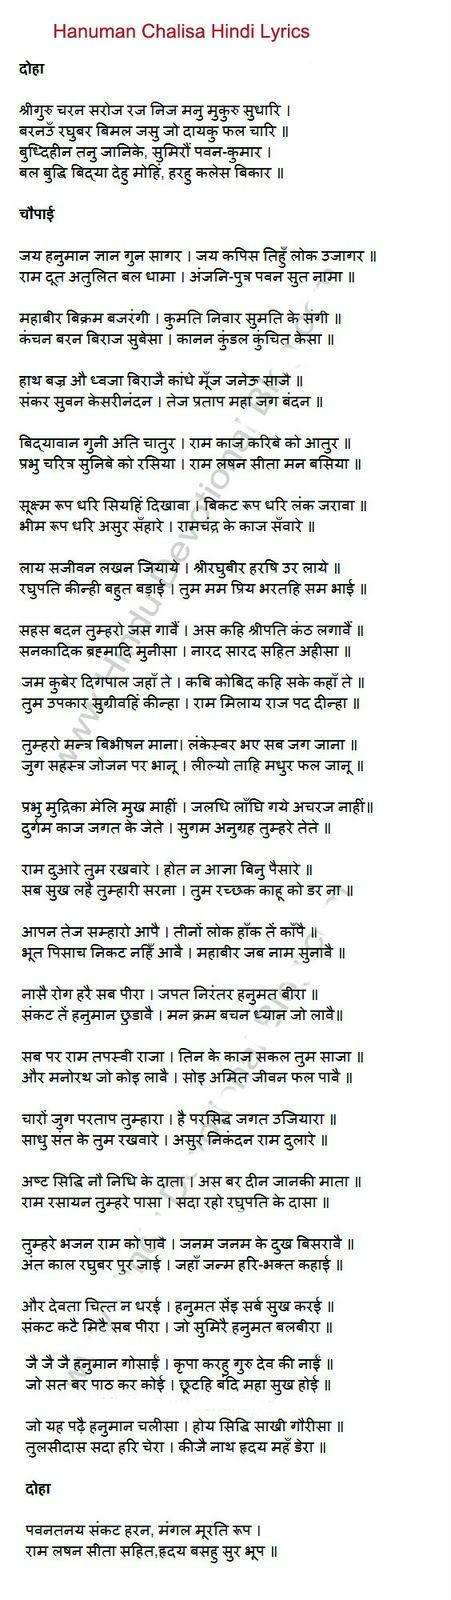 Read Online Hanuman Chalisa Lyrics in Hindi | Hanuman